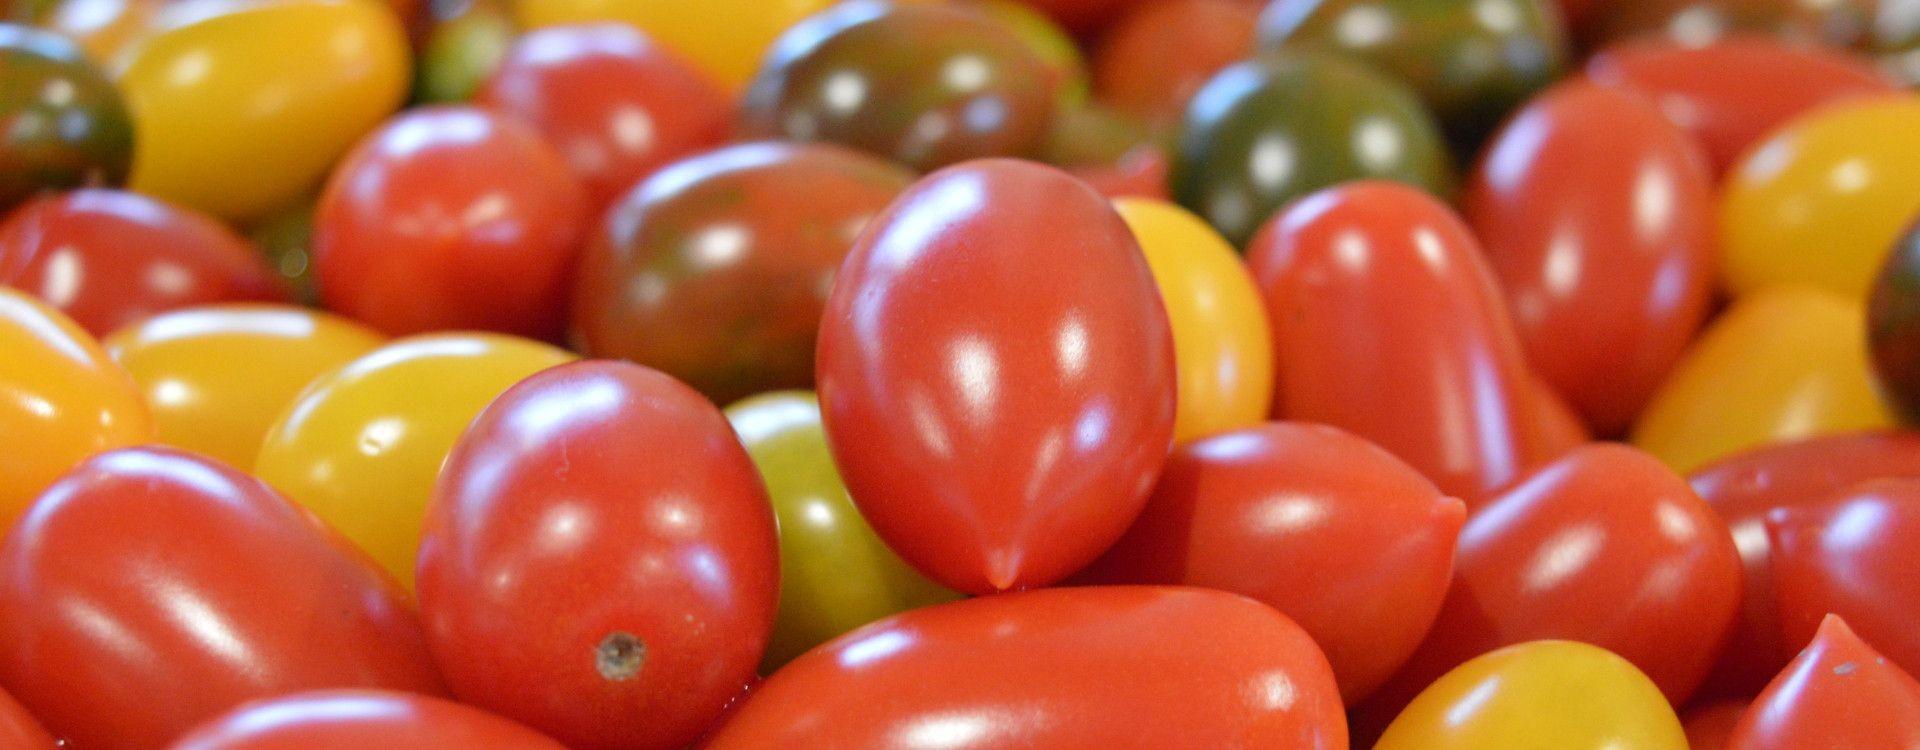 Mangiare di stagione: perchè è meglio?